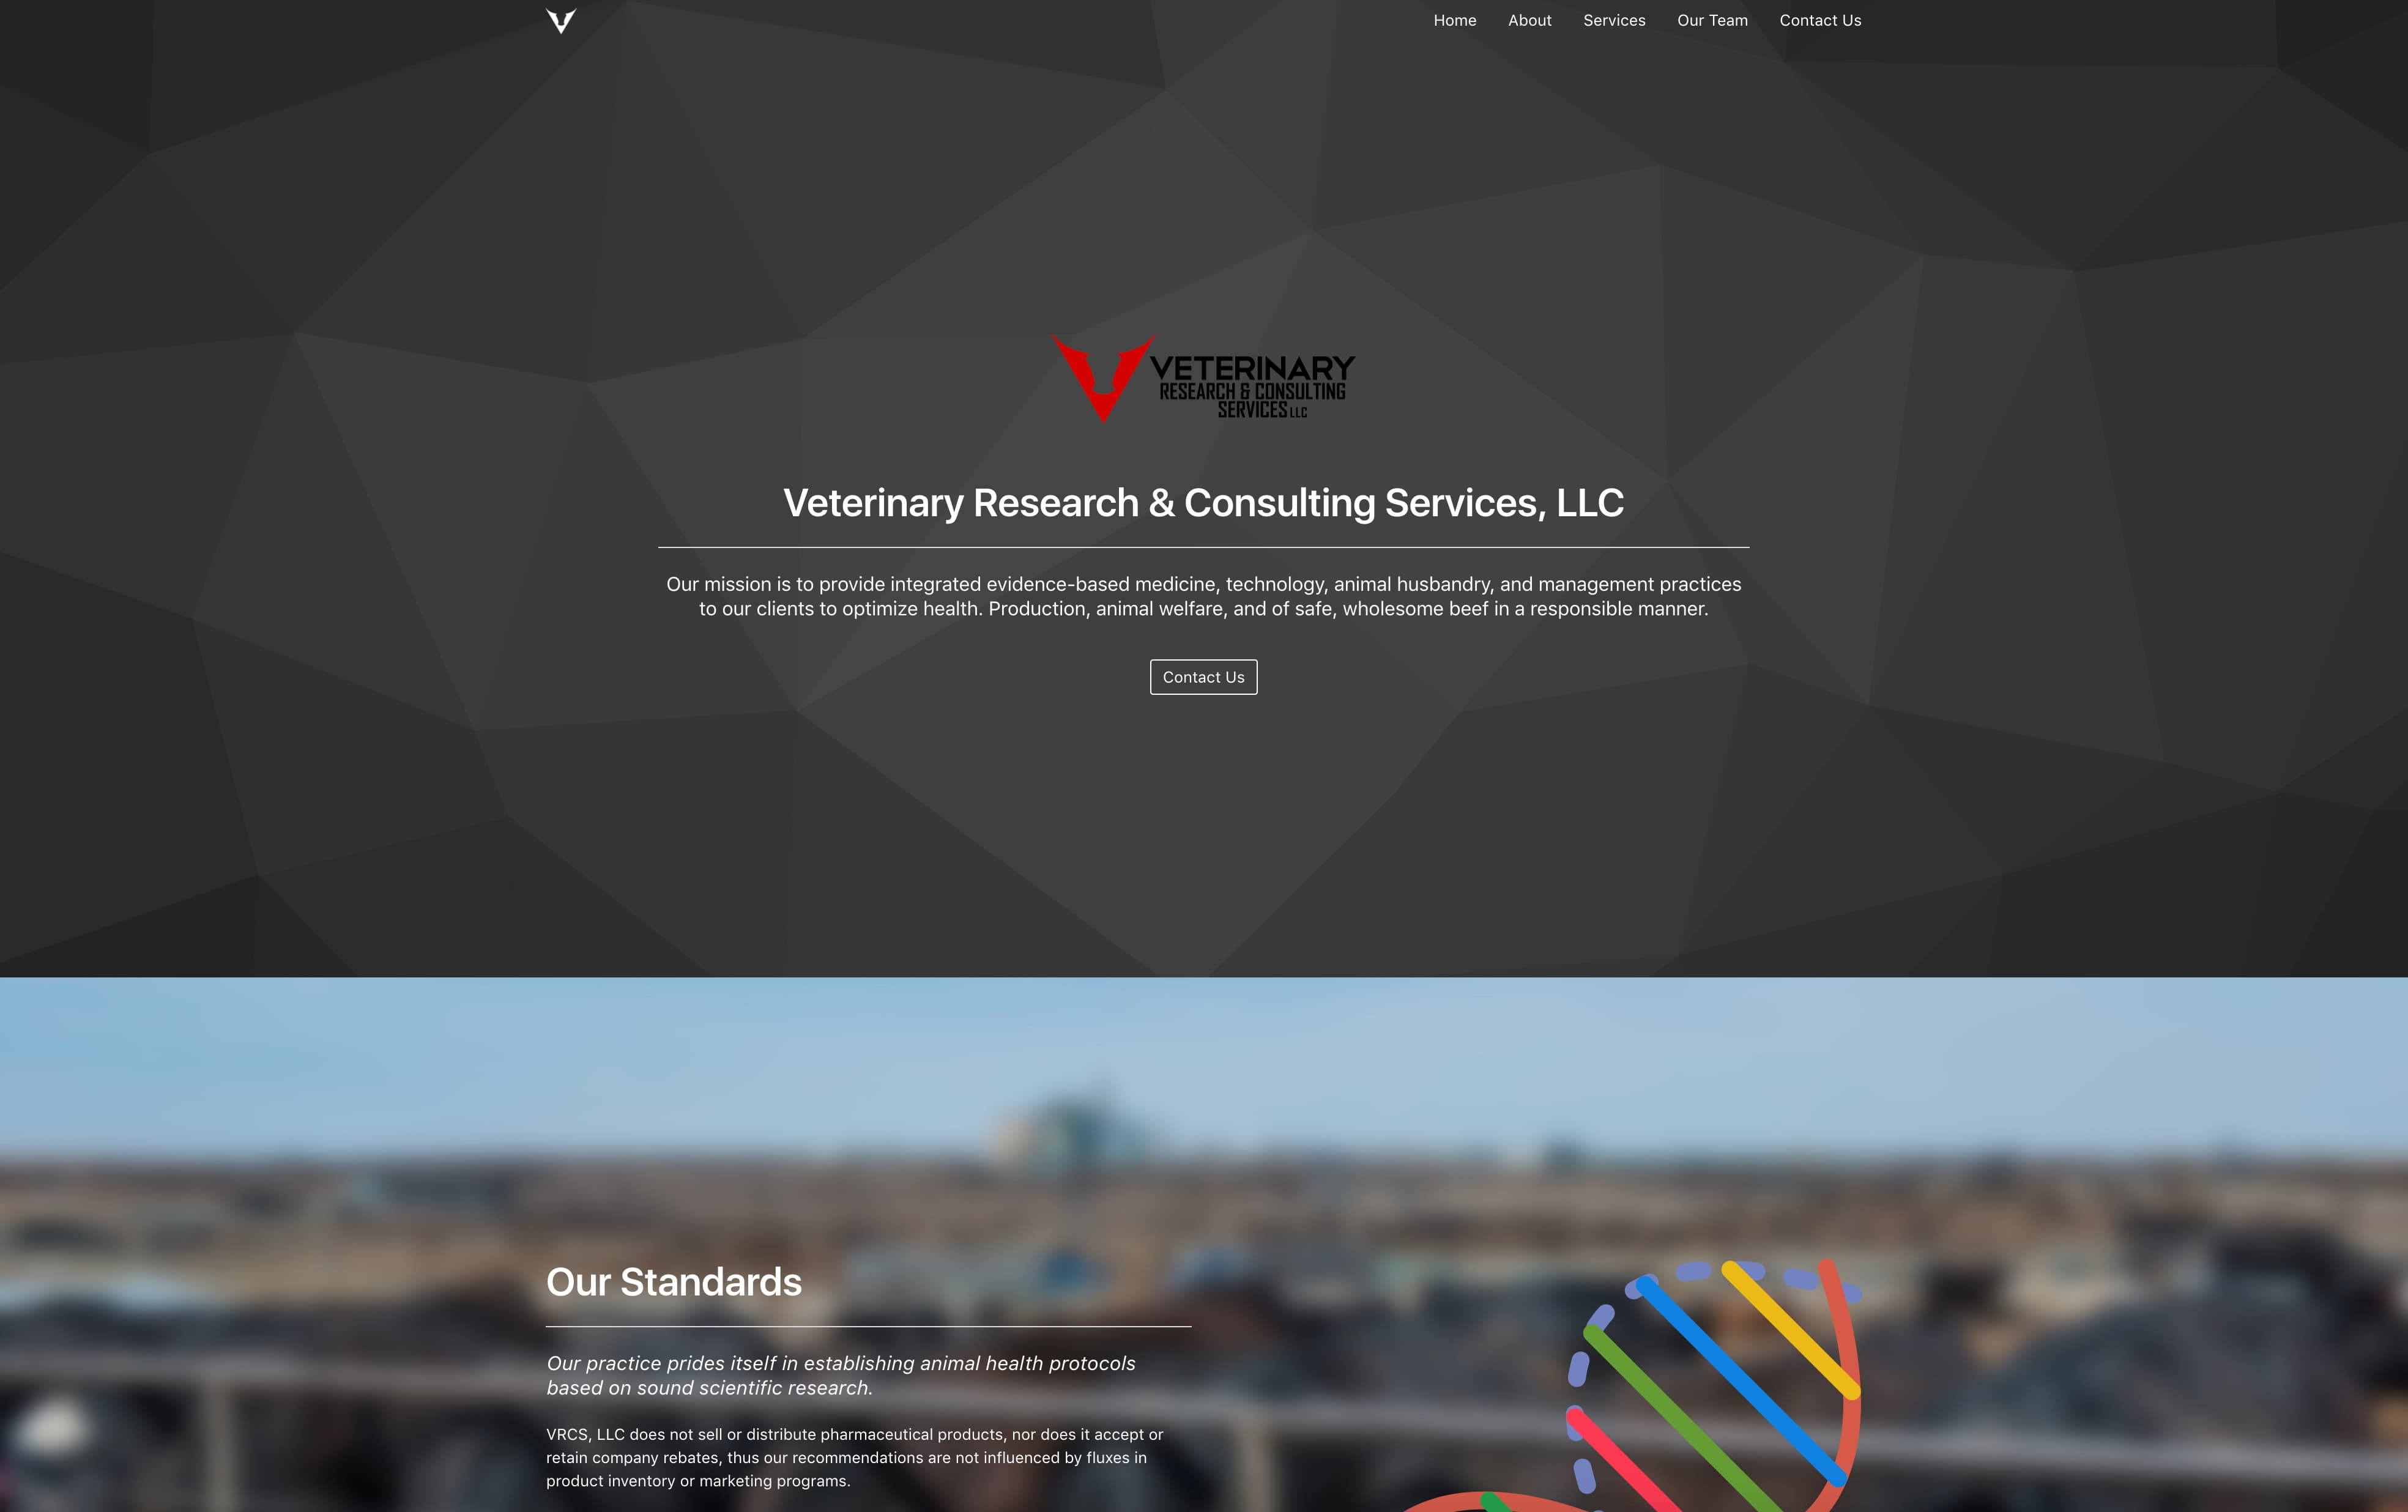 VRCS, LLC